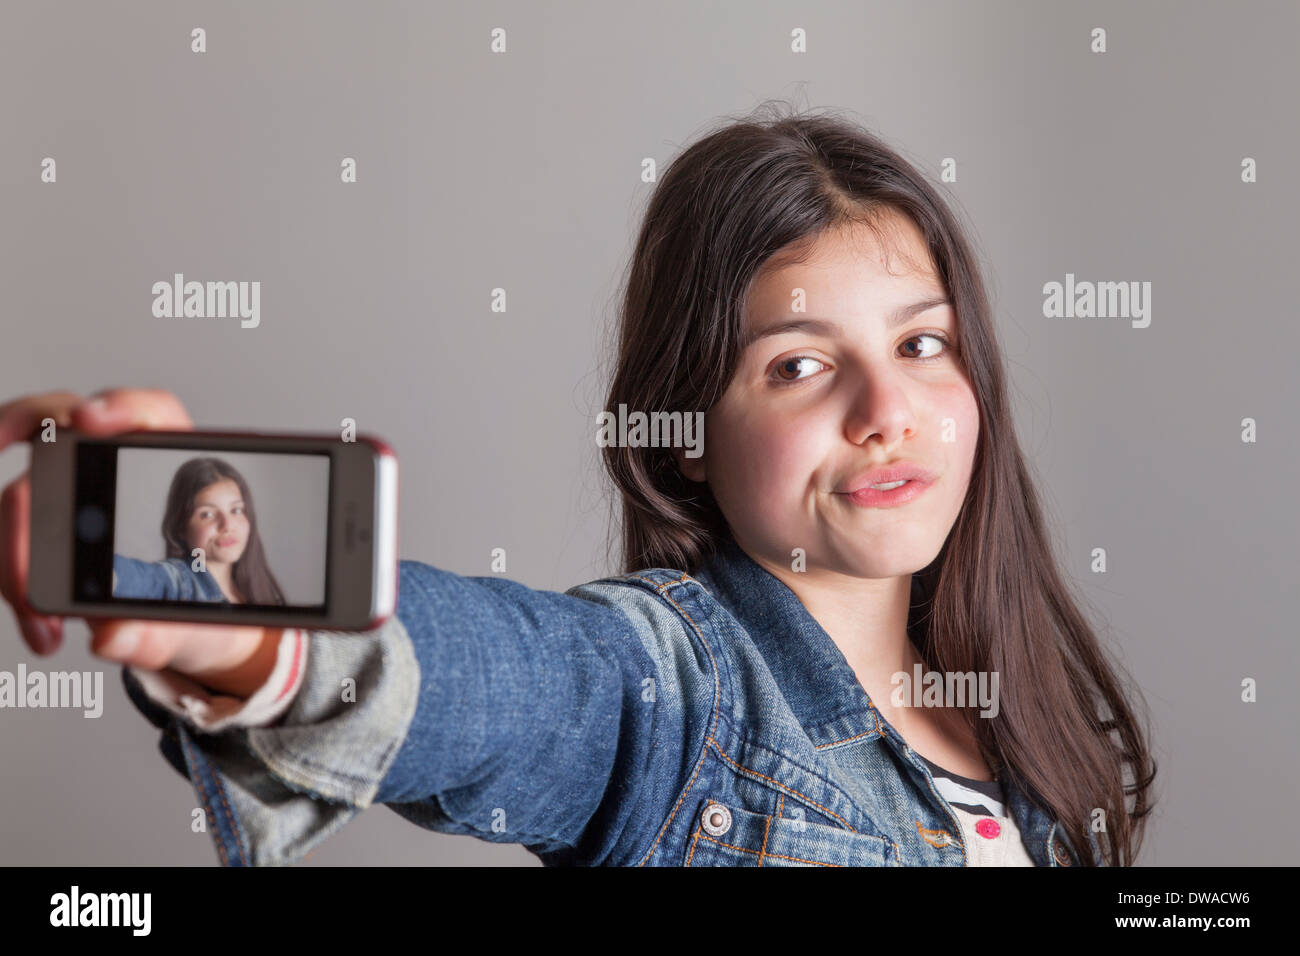 Teenage girl takes a selfie on camera phone - Stock Image